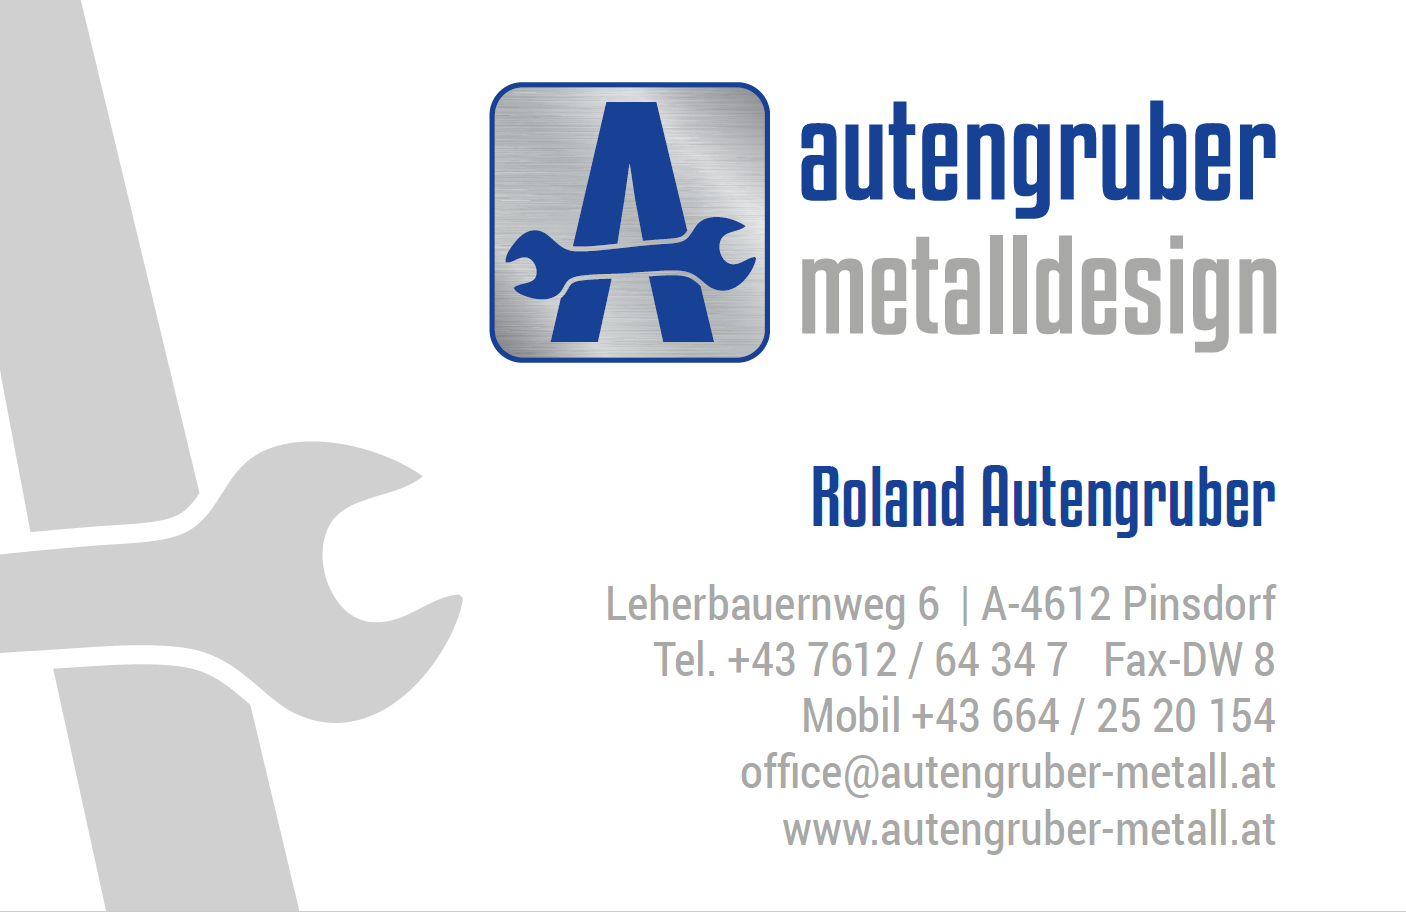 Autengruber Metalldesign GmbH